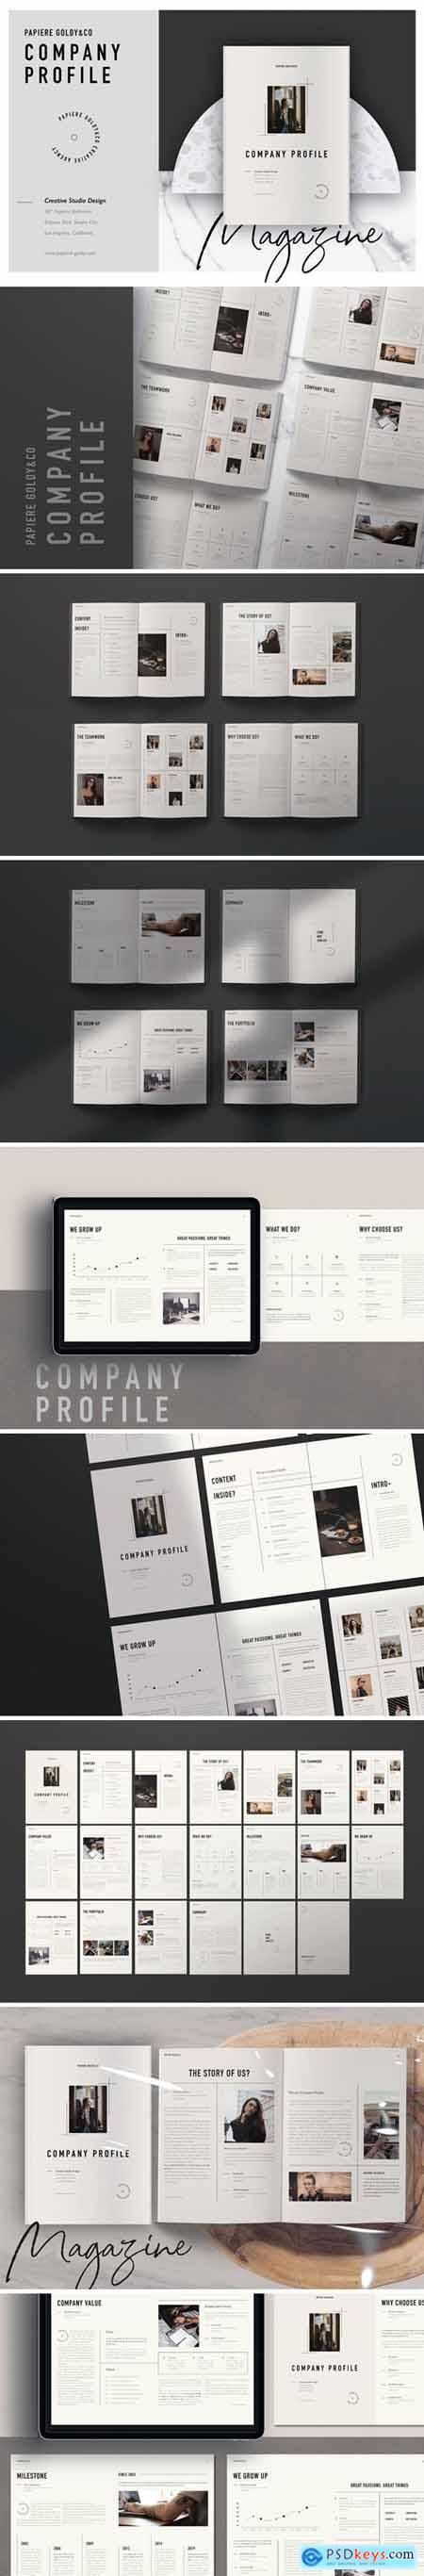 Papiere Goldy & Co Company Profile